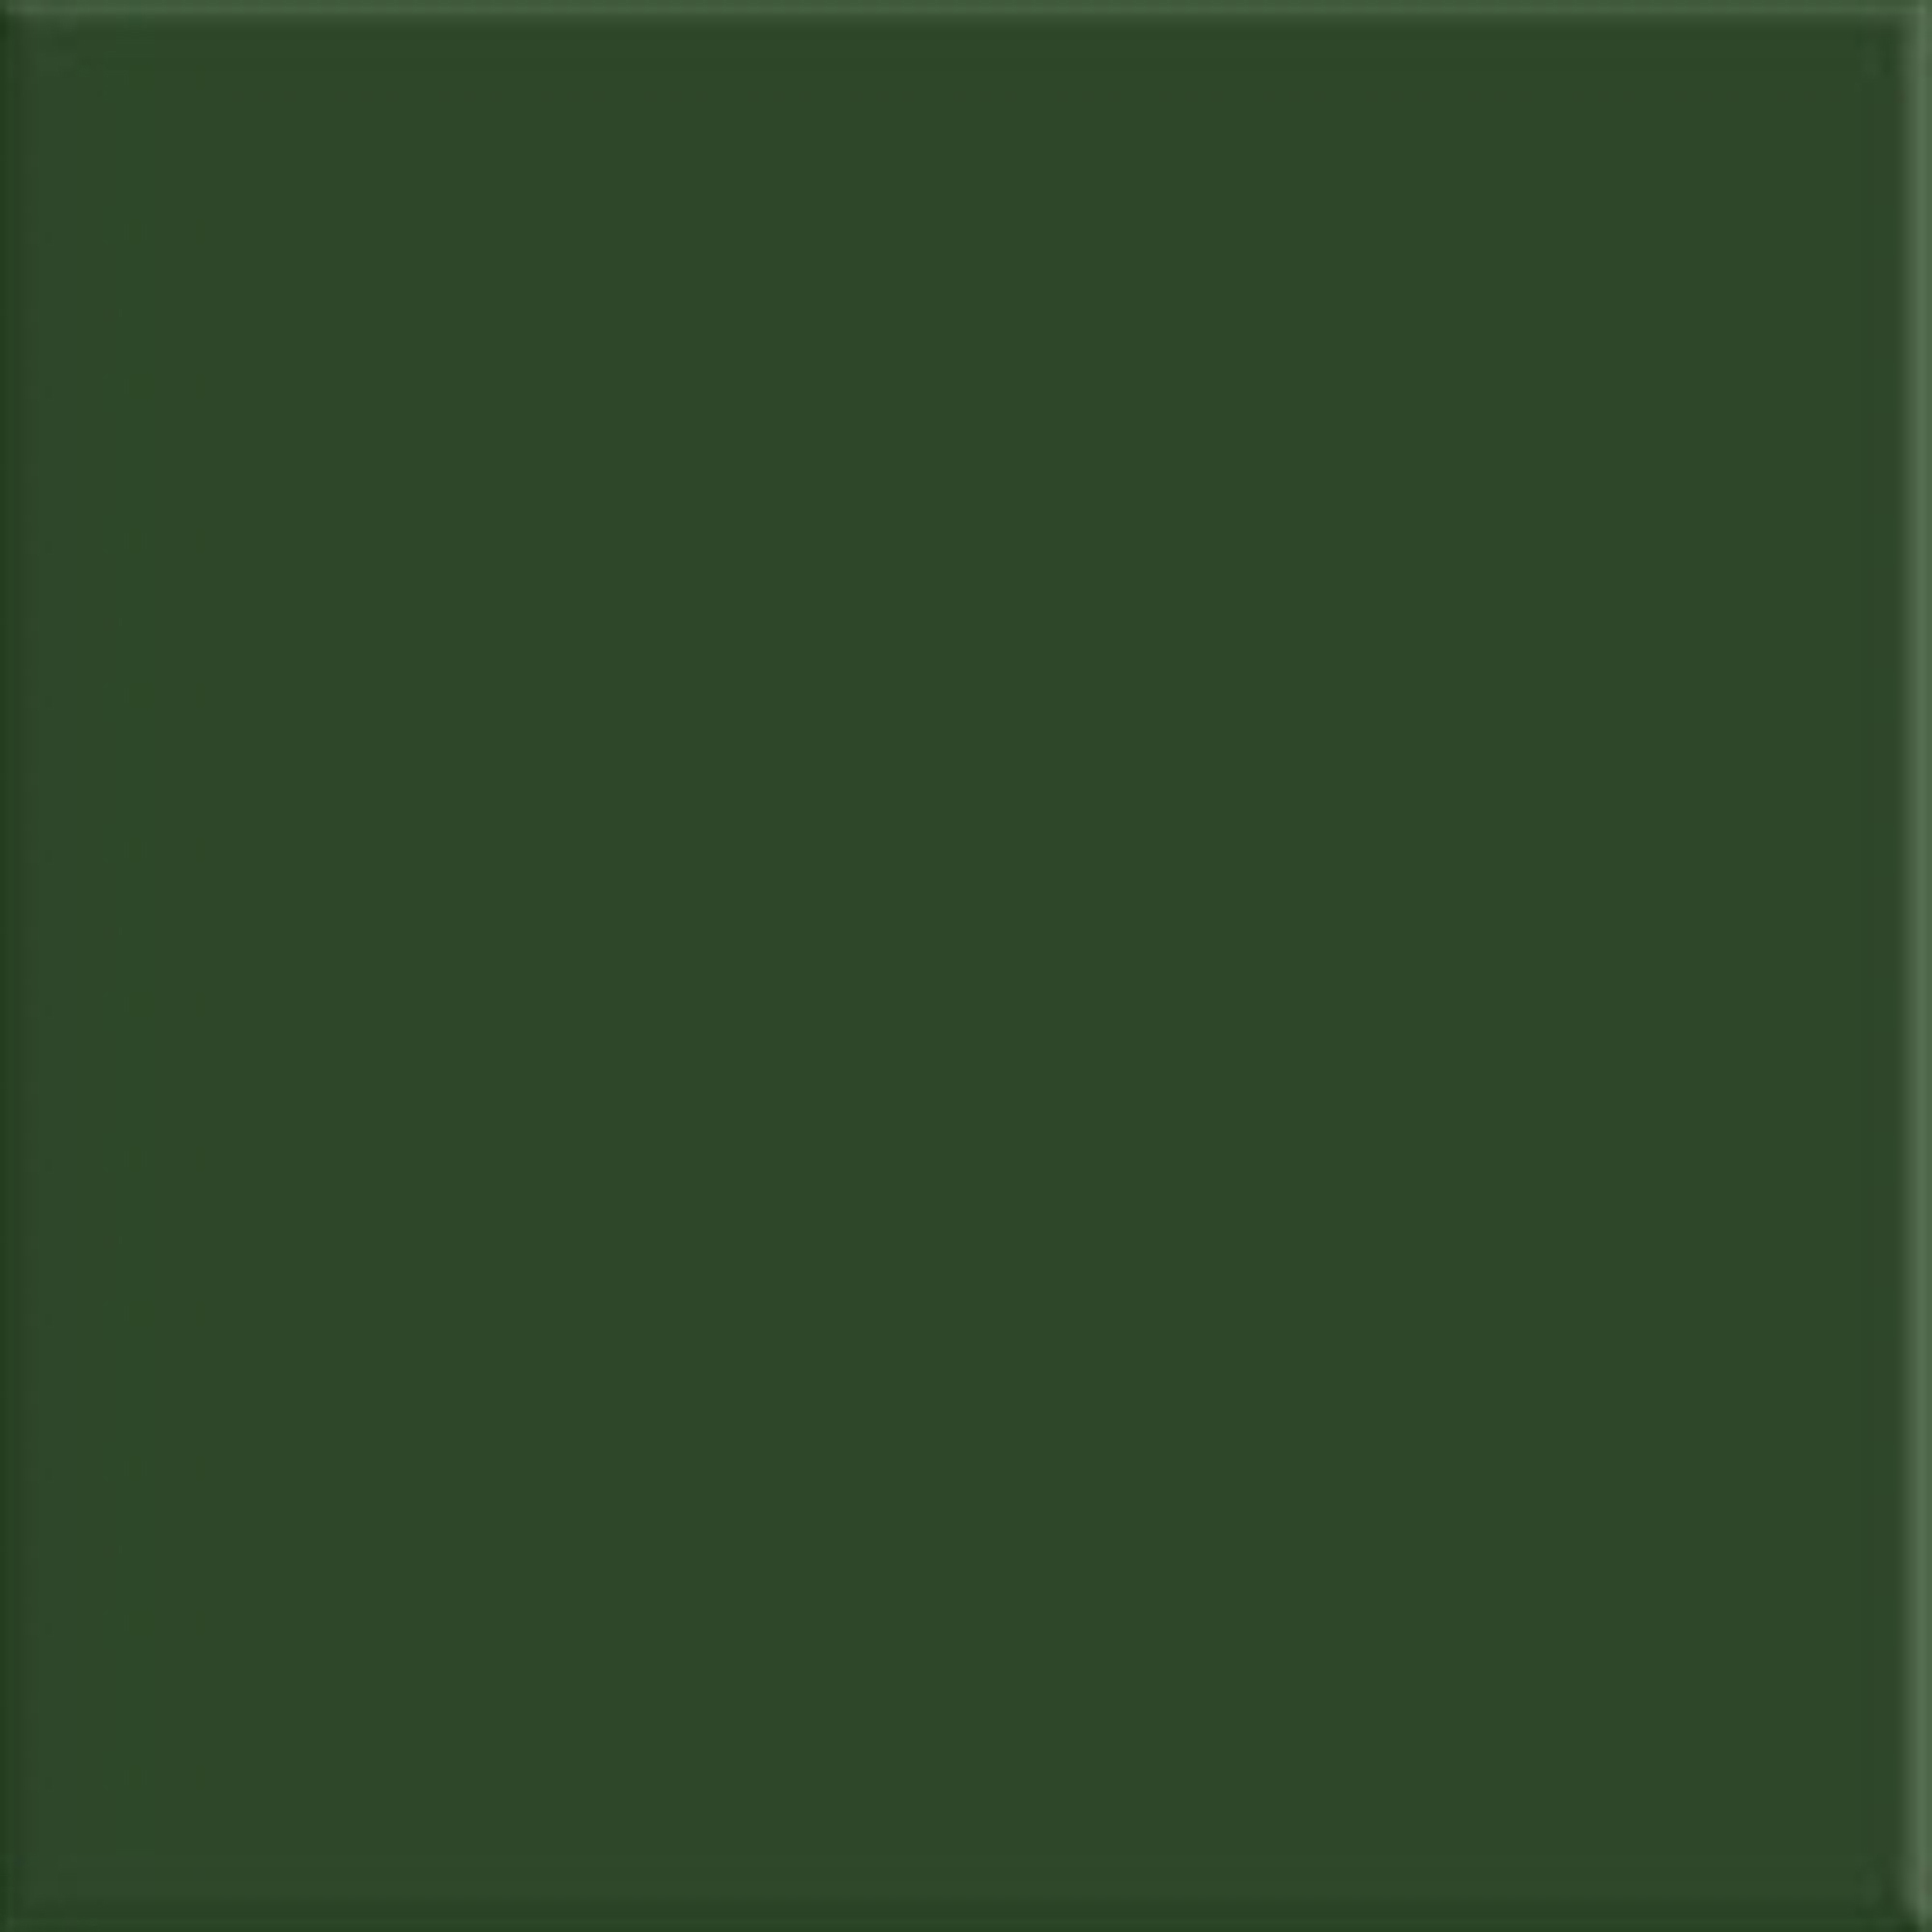 johnson prismatics victorian green